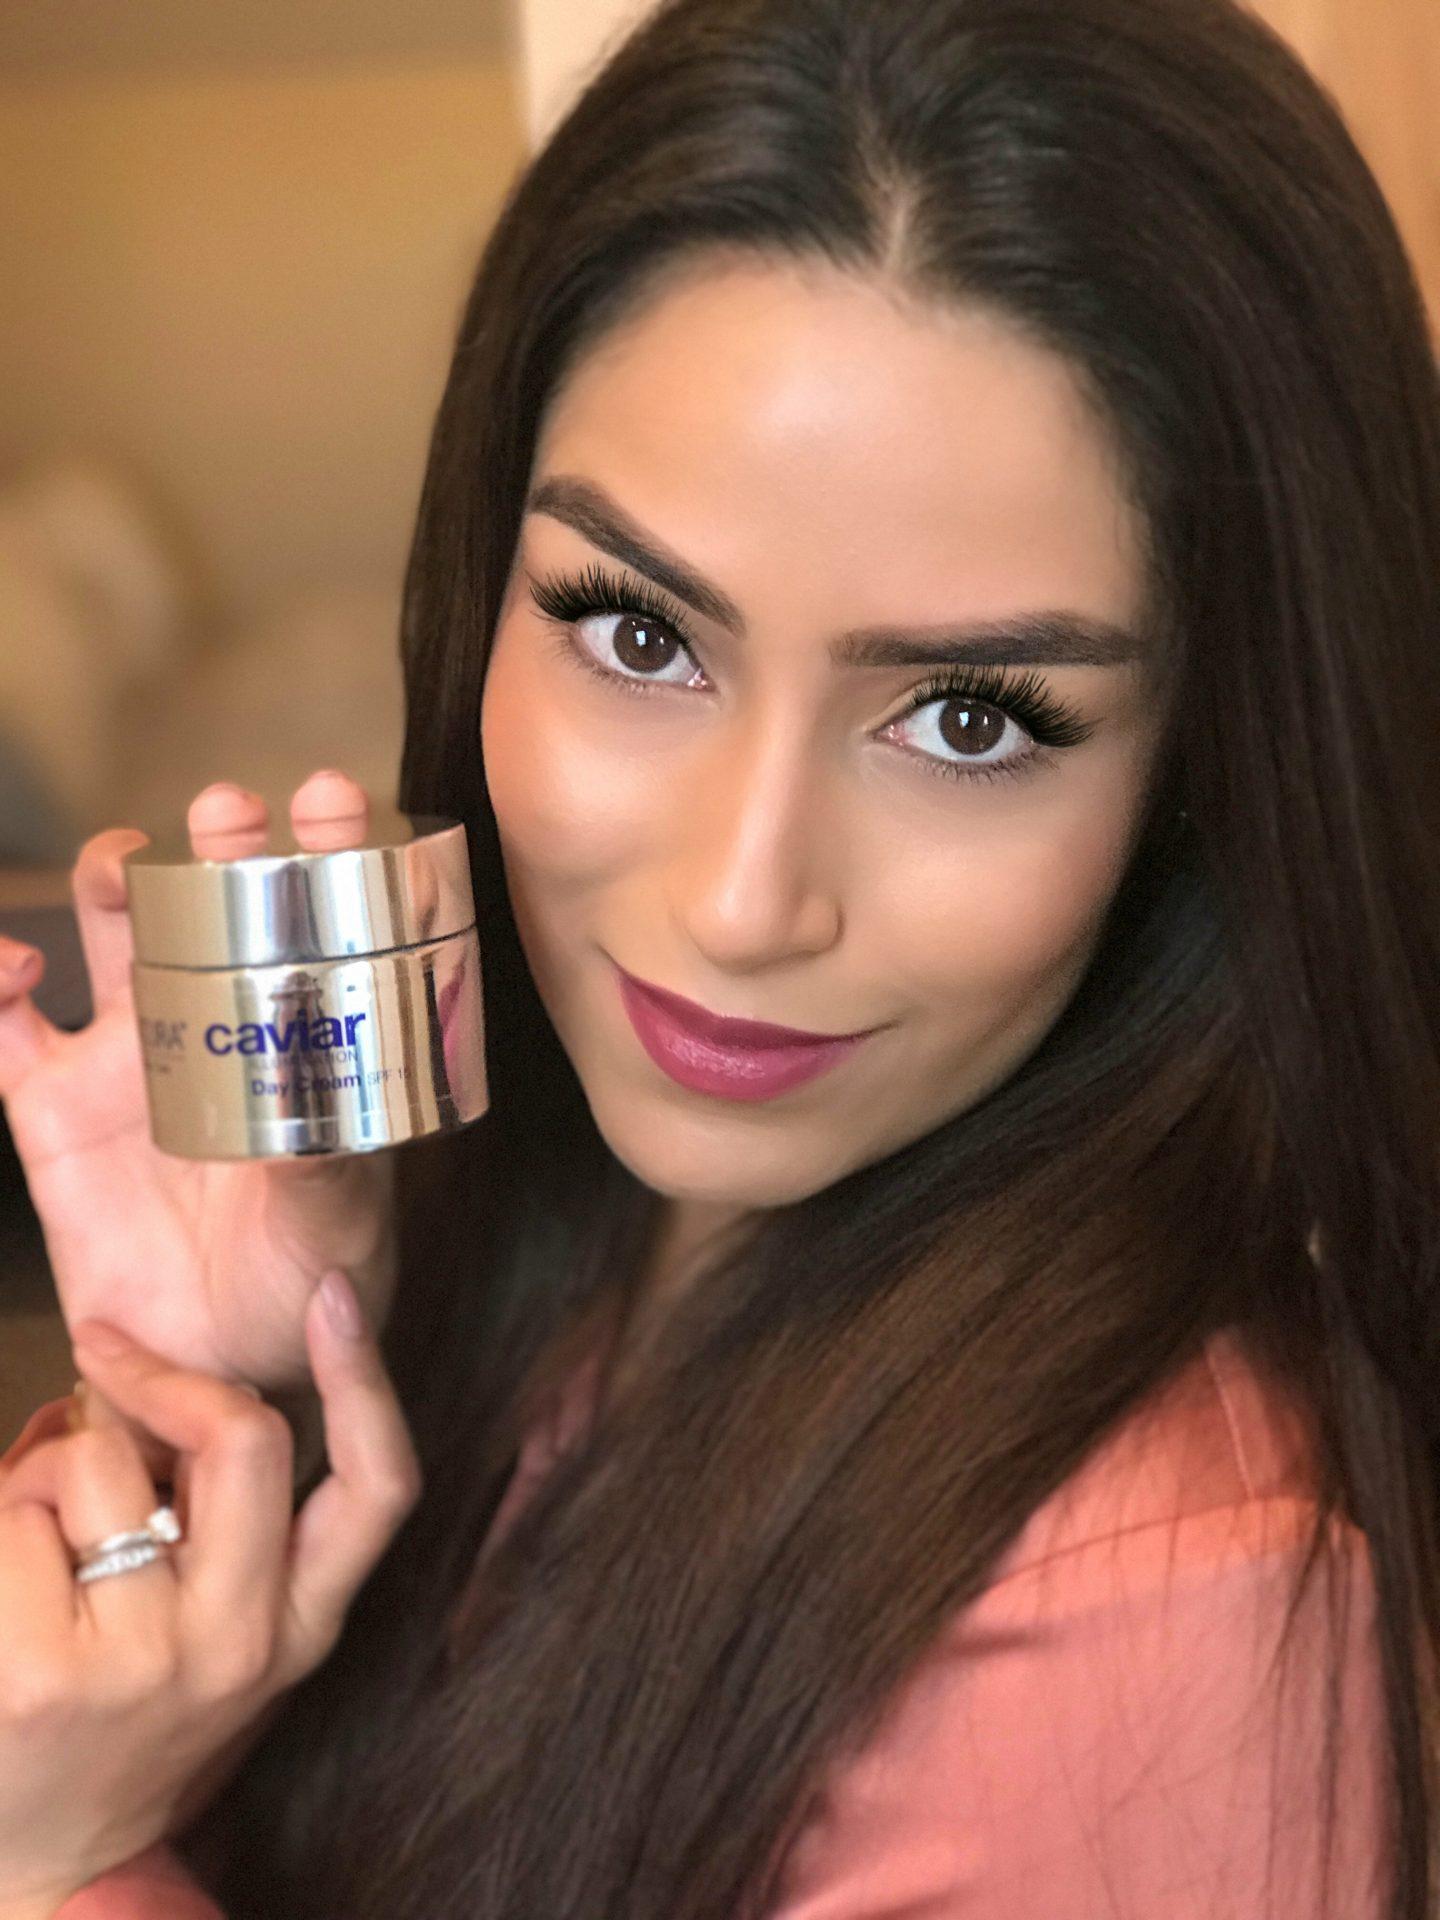 Affordable caviar face cream